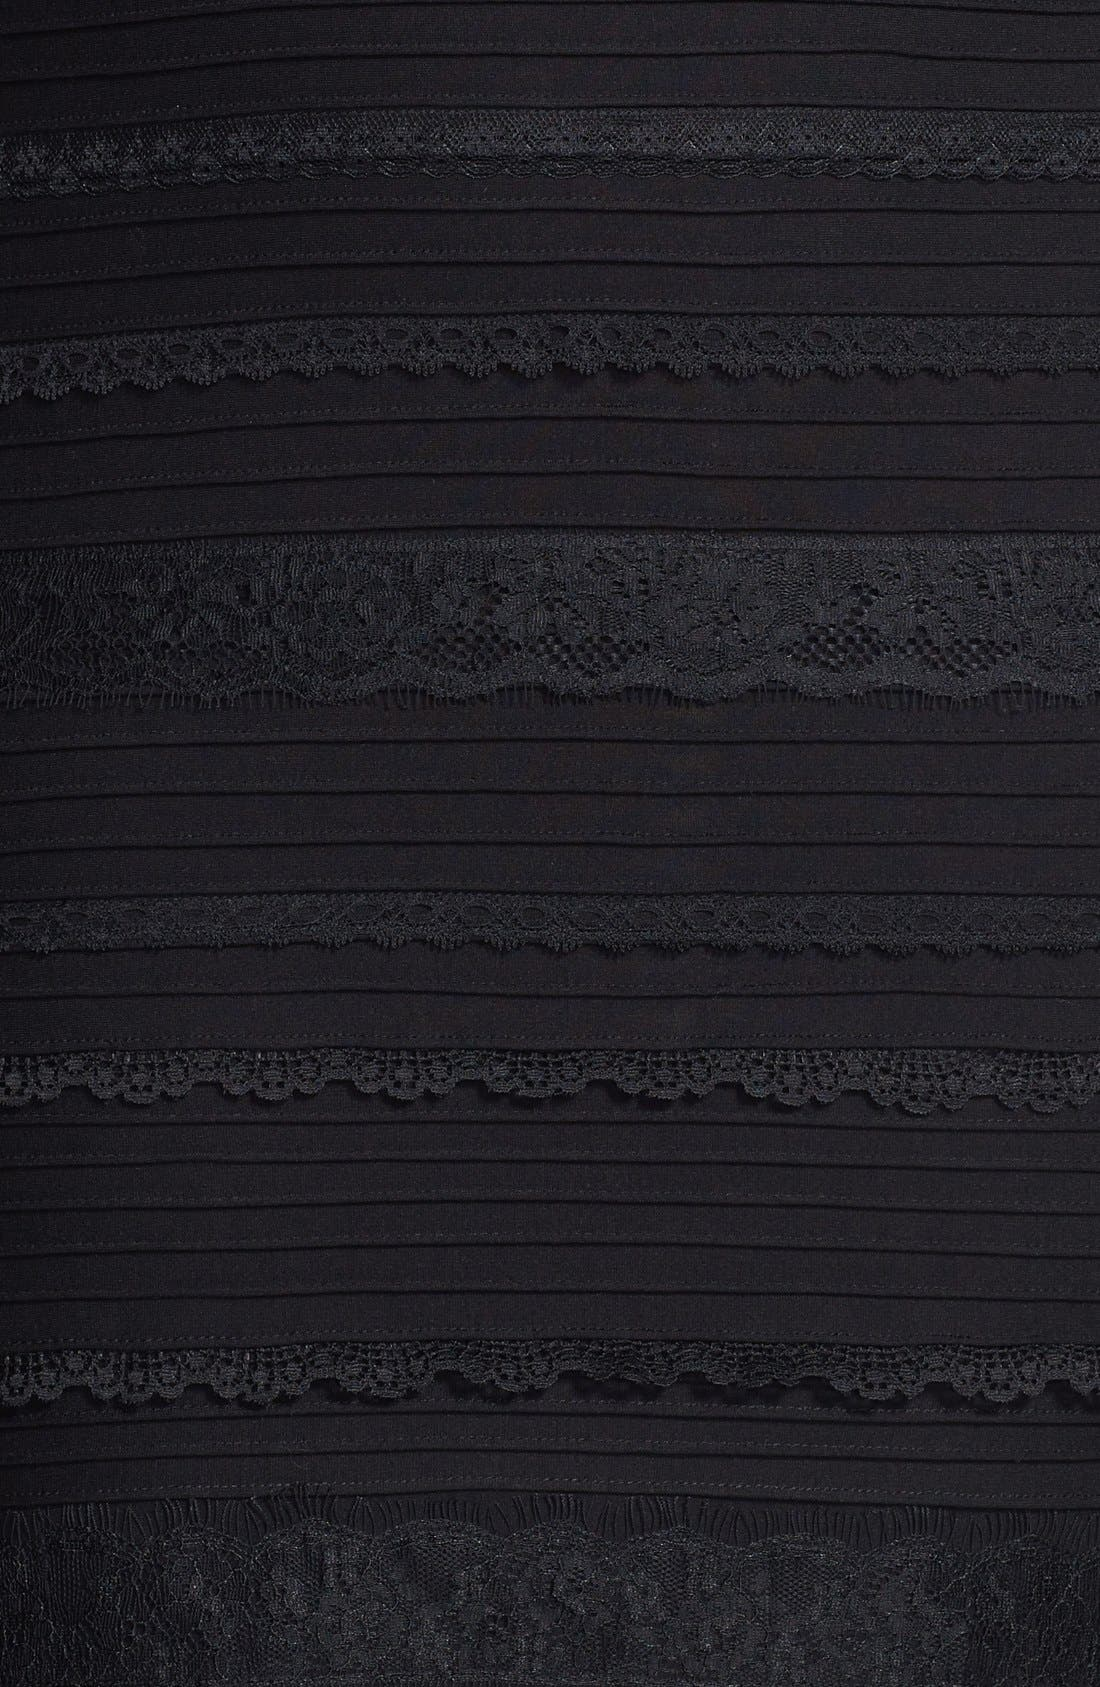 Lace Trim Banded Sheath Dress,                             Alternate thumbnail 2, color,                             001